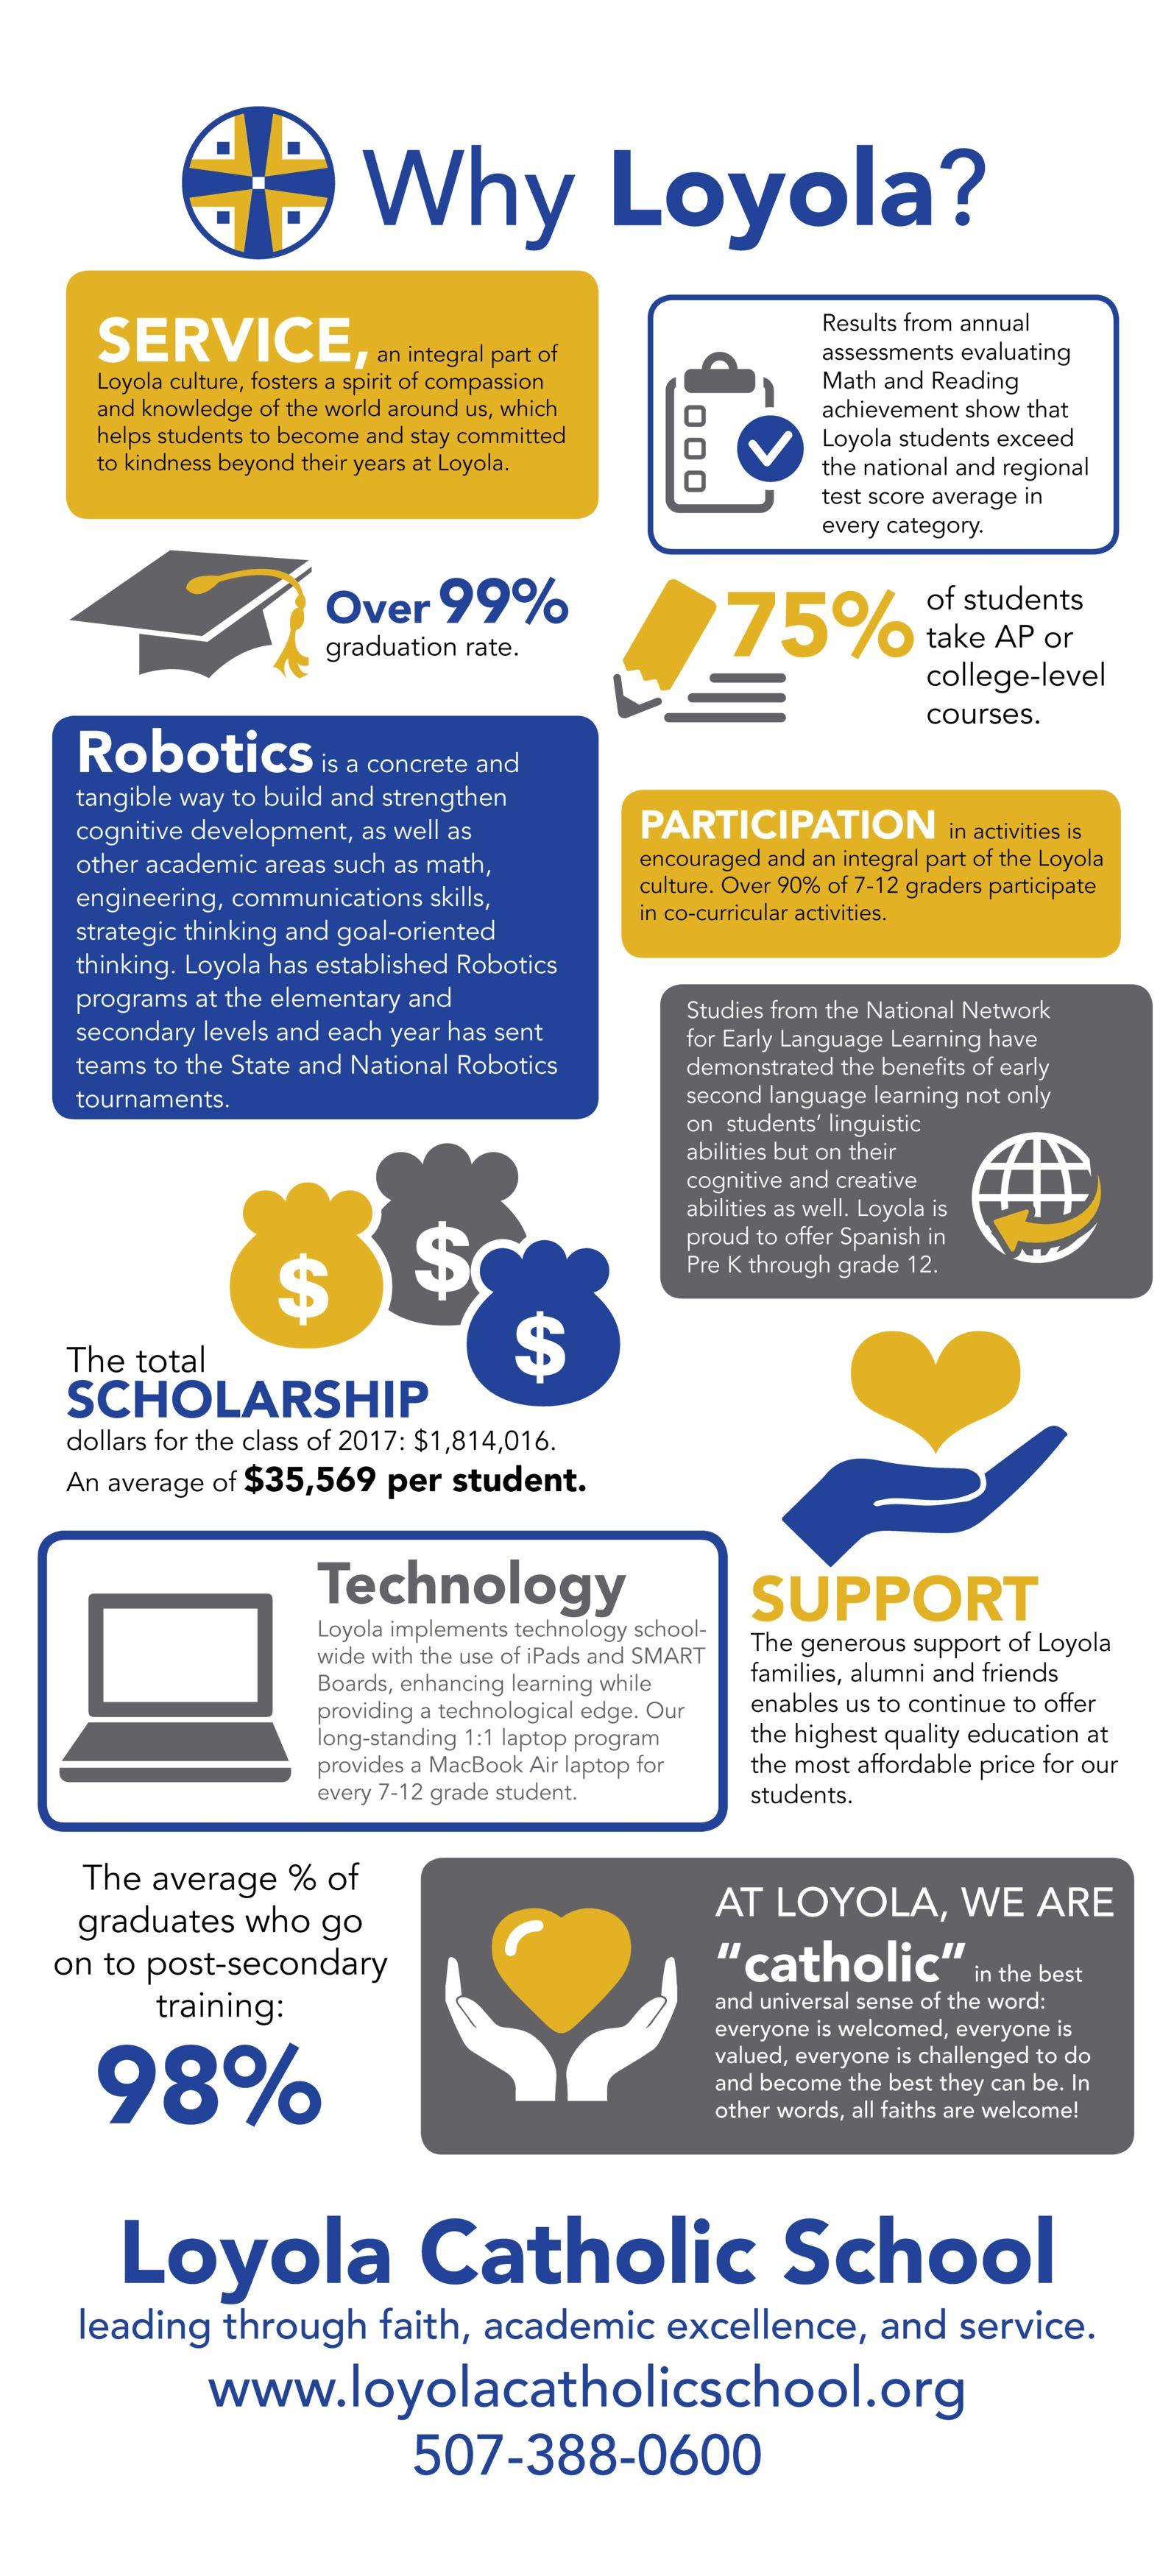 Loyola Catholic School Infographic